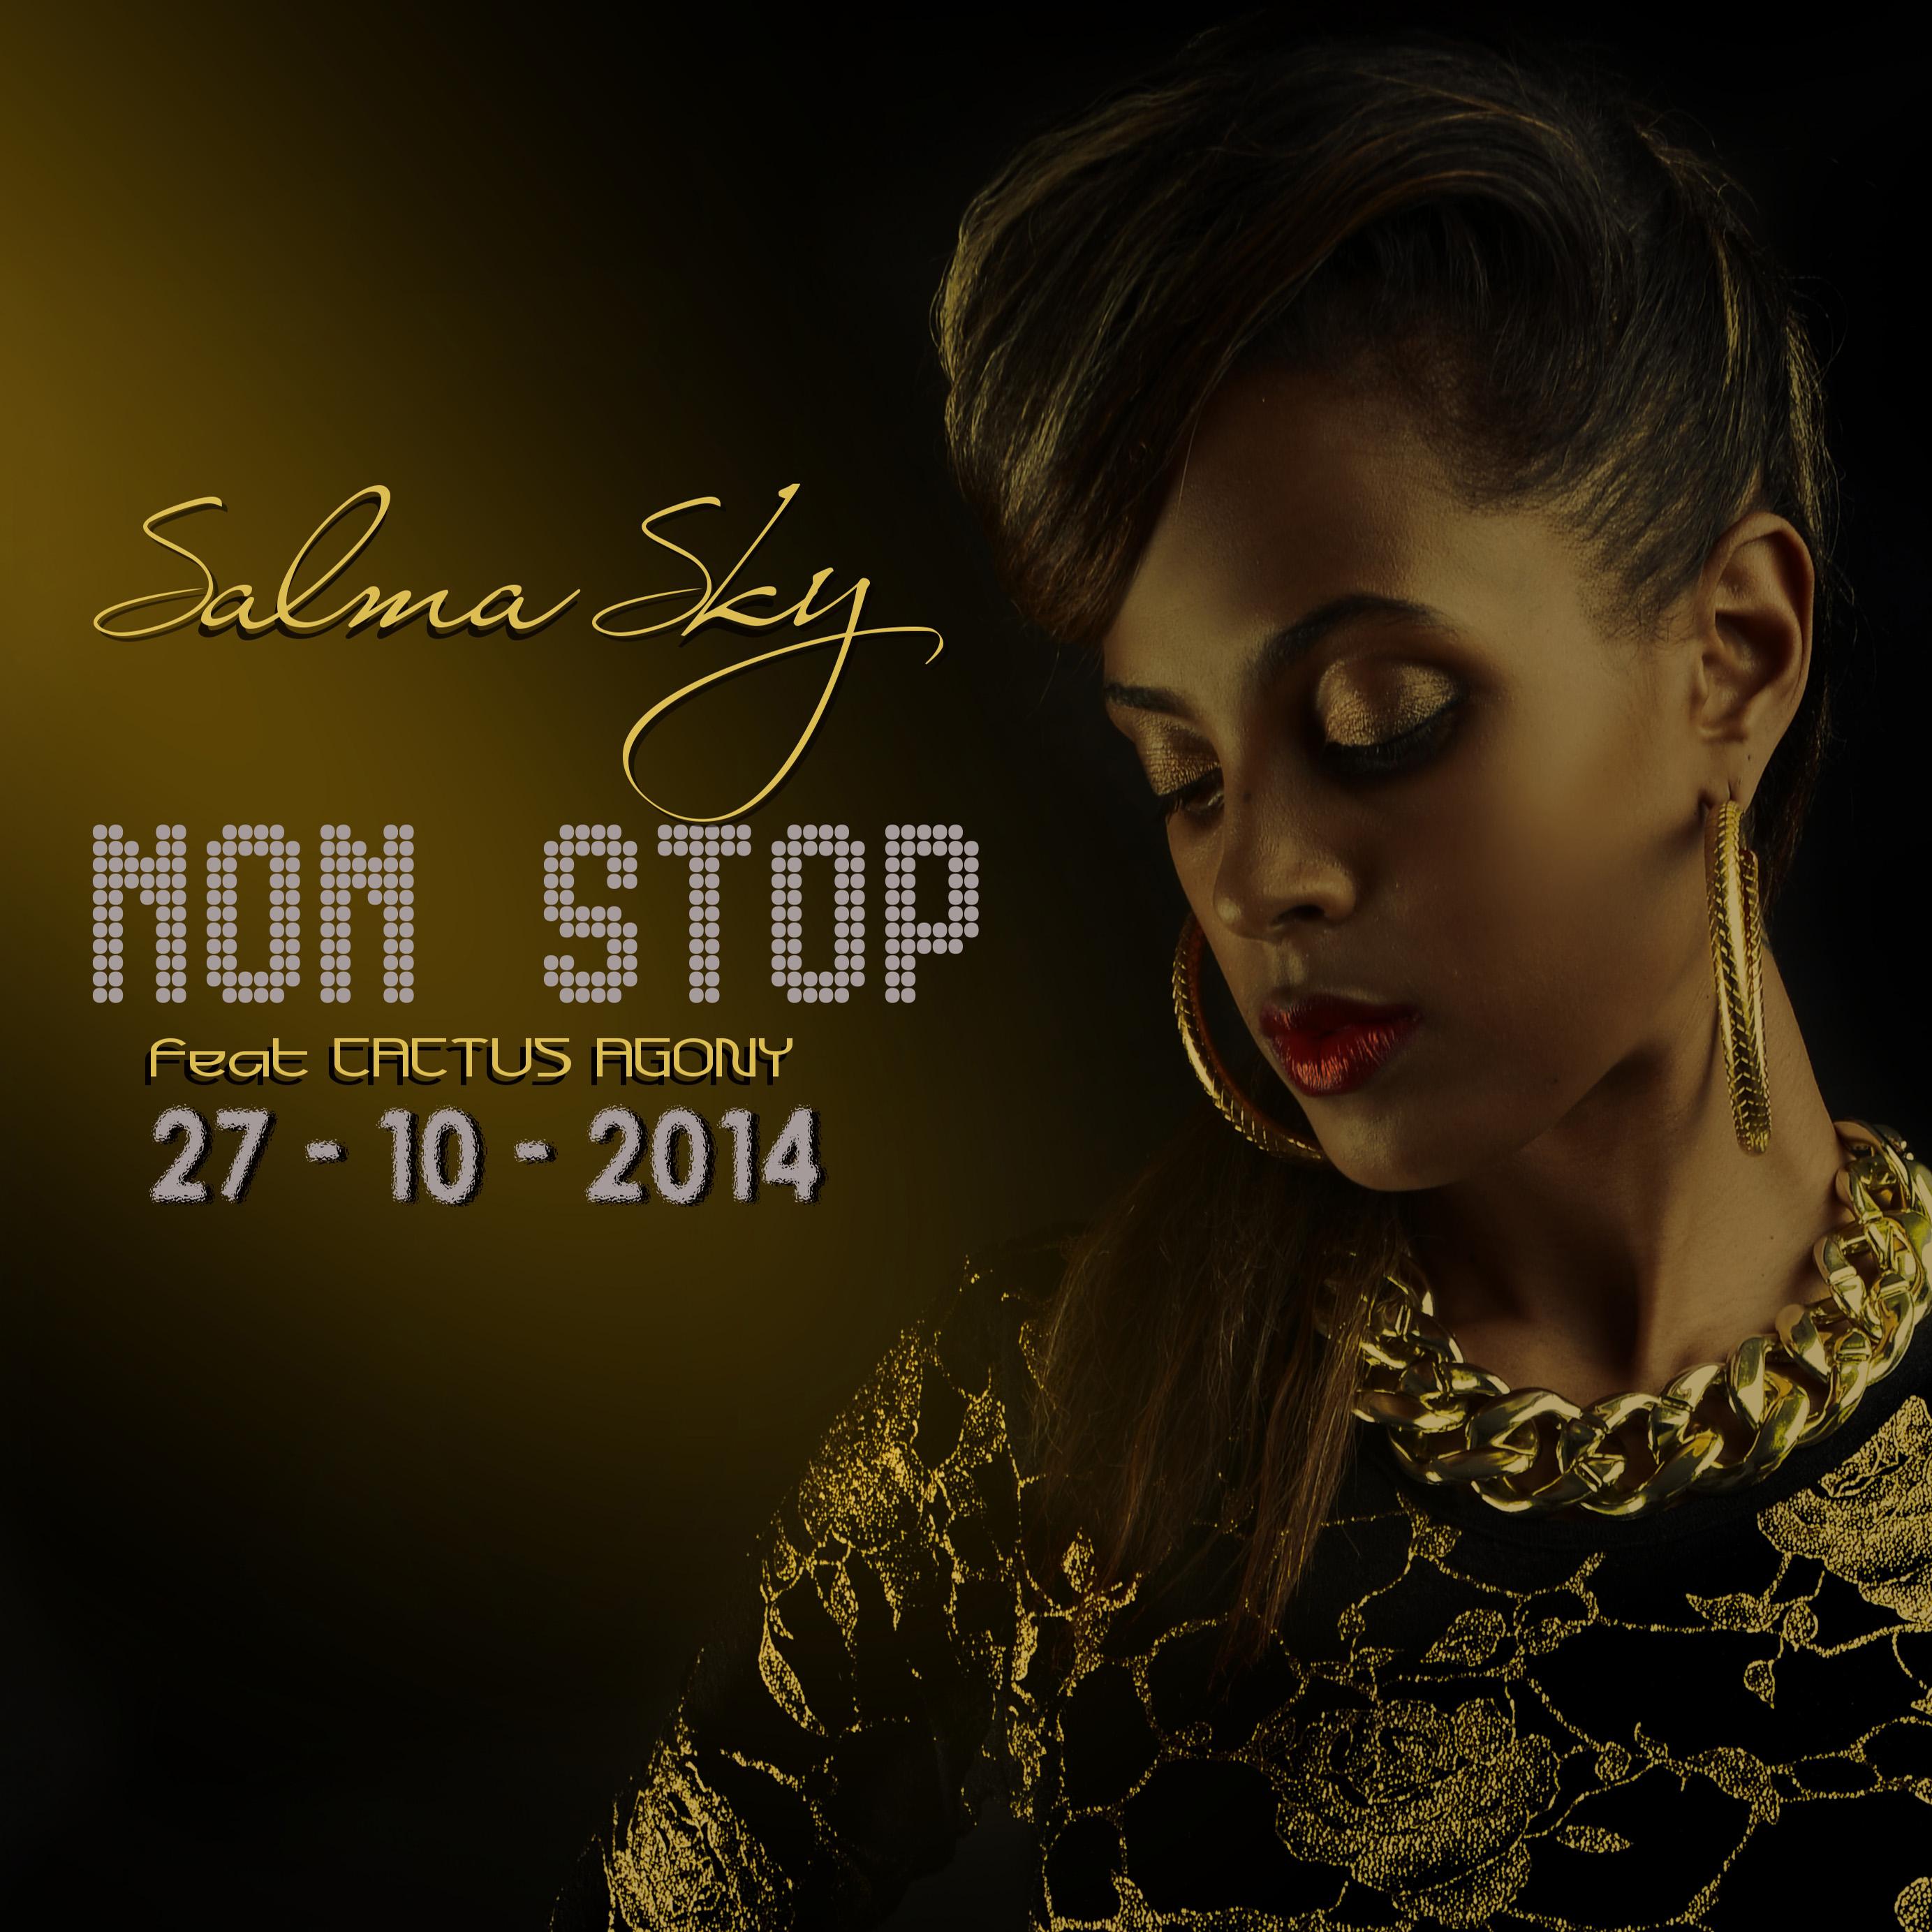 Salma Sky – Non-Stop Feat. Cactus Agony